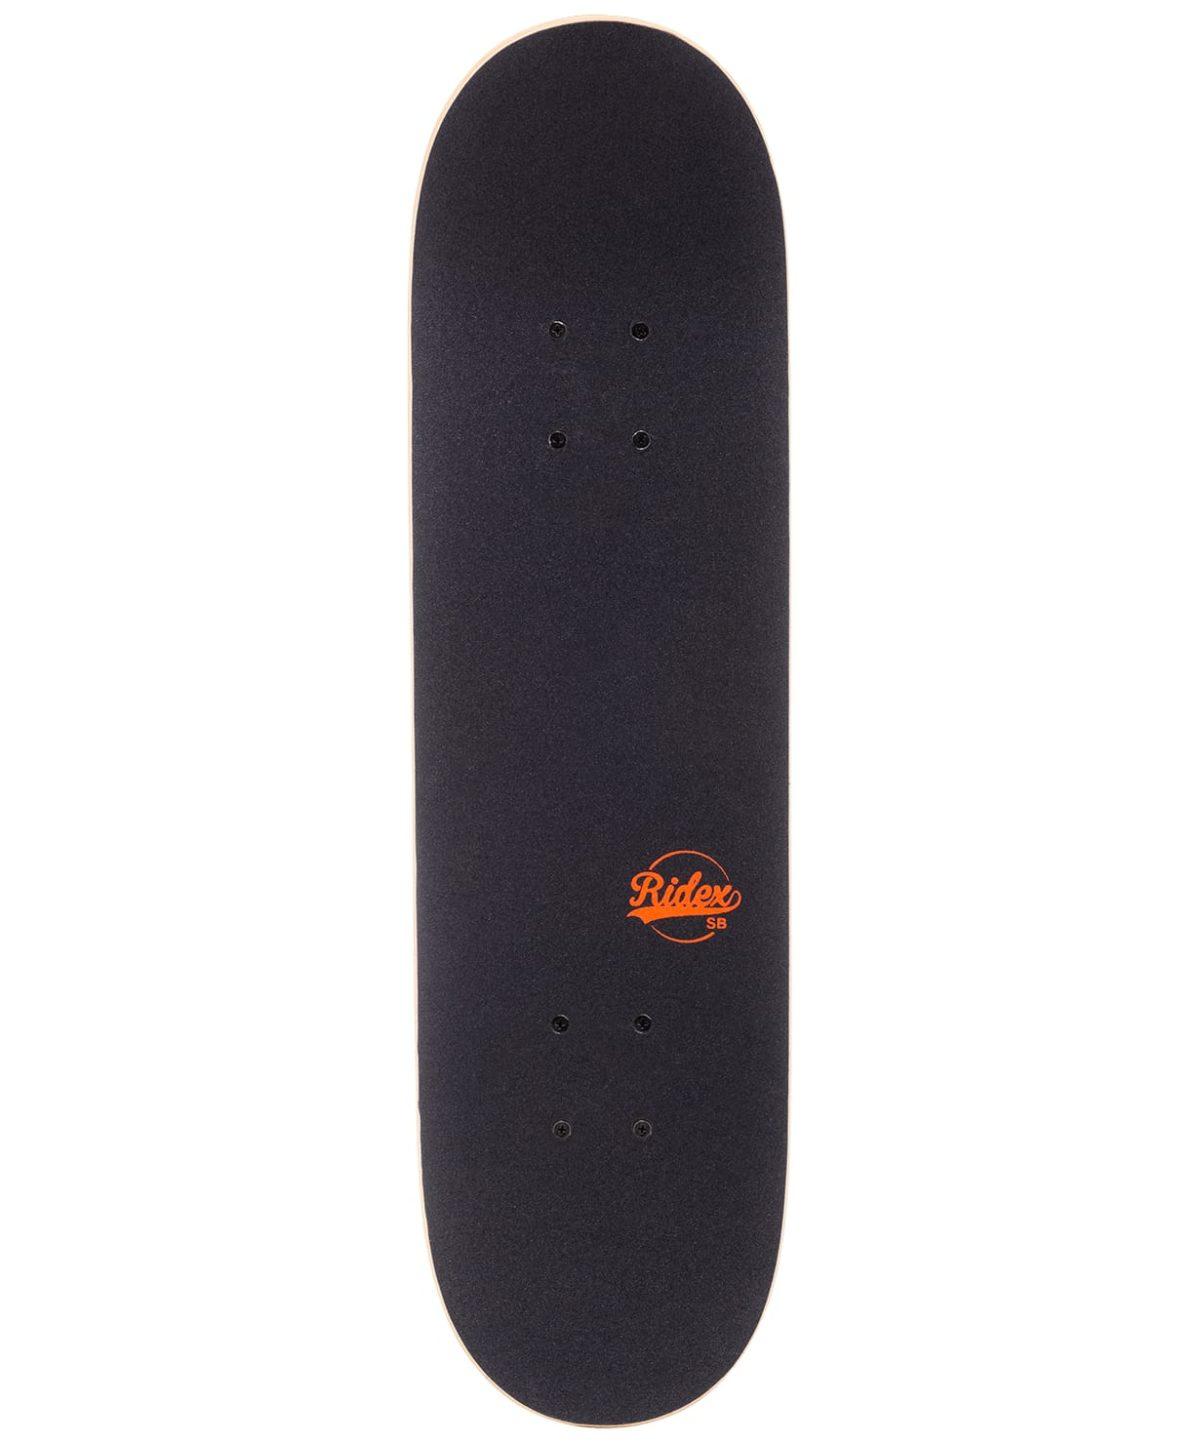 RIDEX скейтборд Nemo 27.5″X7.5″ - 4